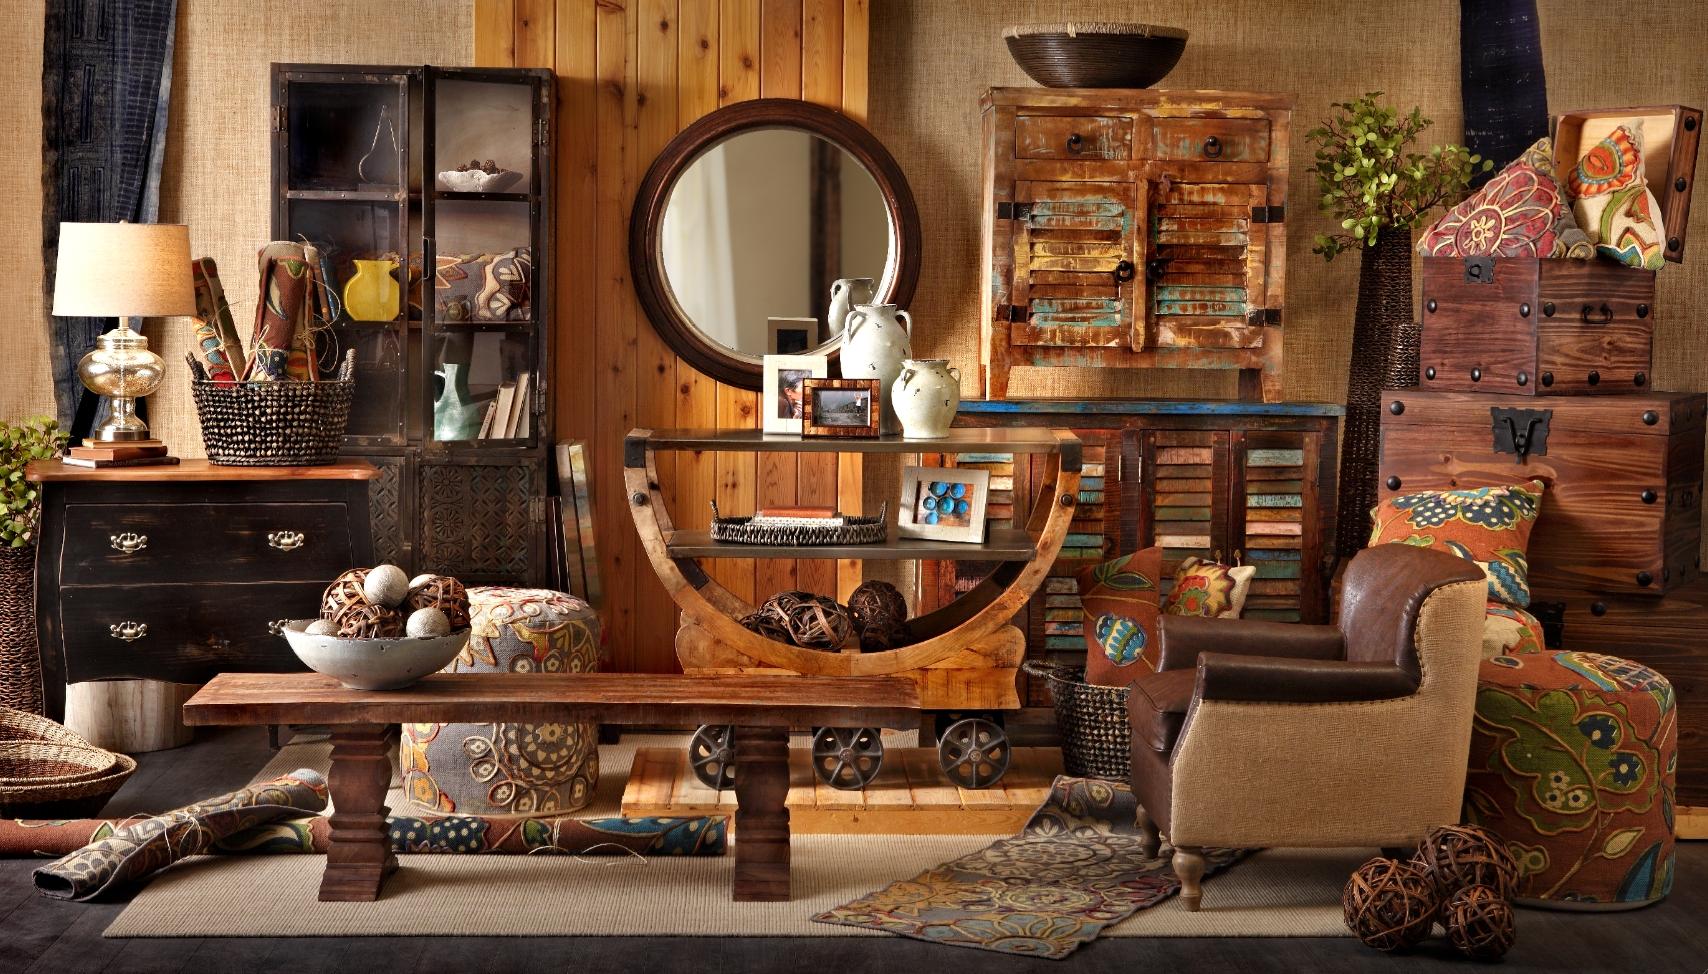 furniture row sofa mart financing sofascore barcelona vs espanyol 20 collection of chairs ideas